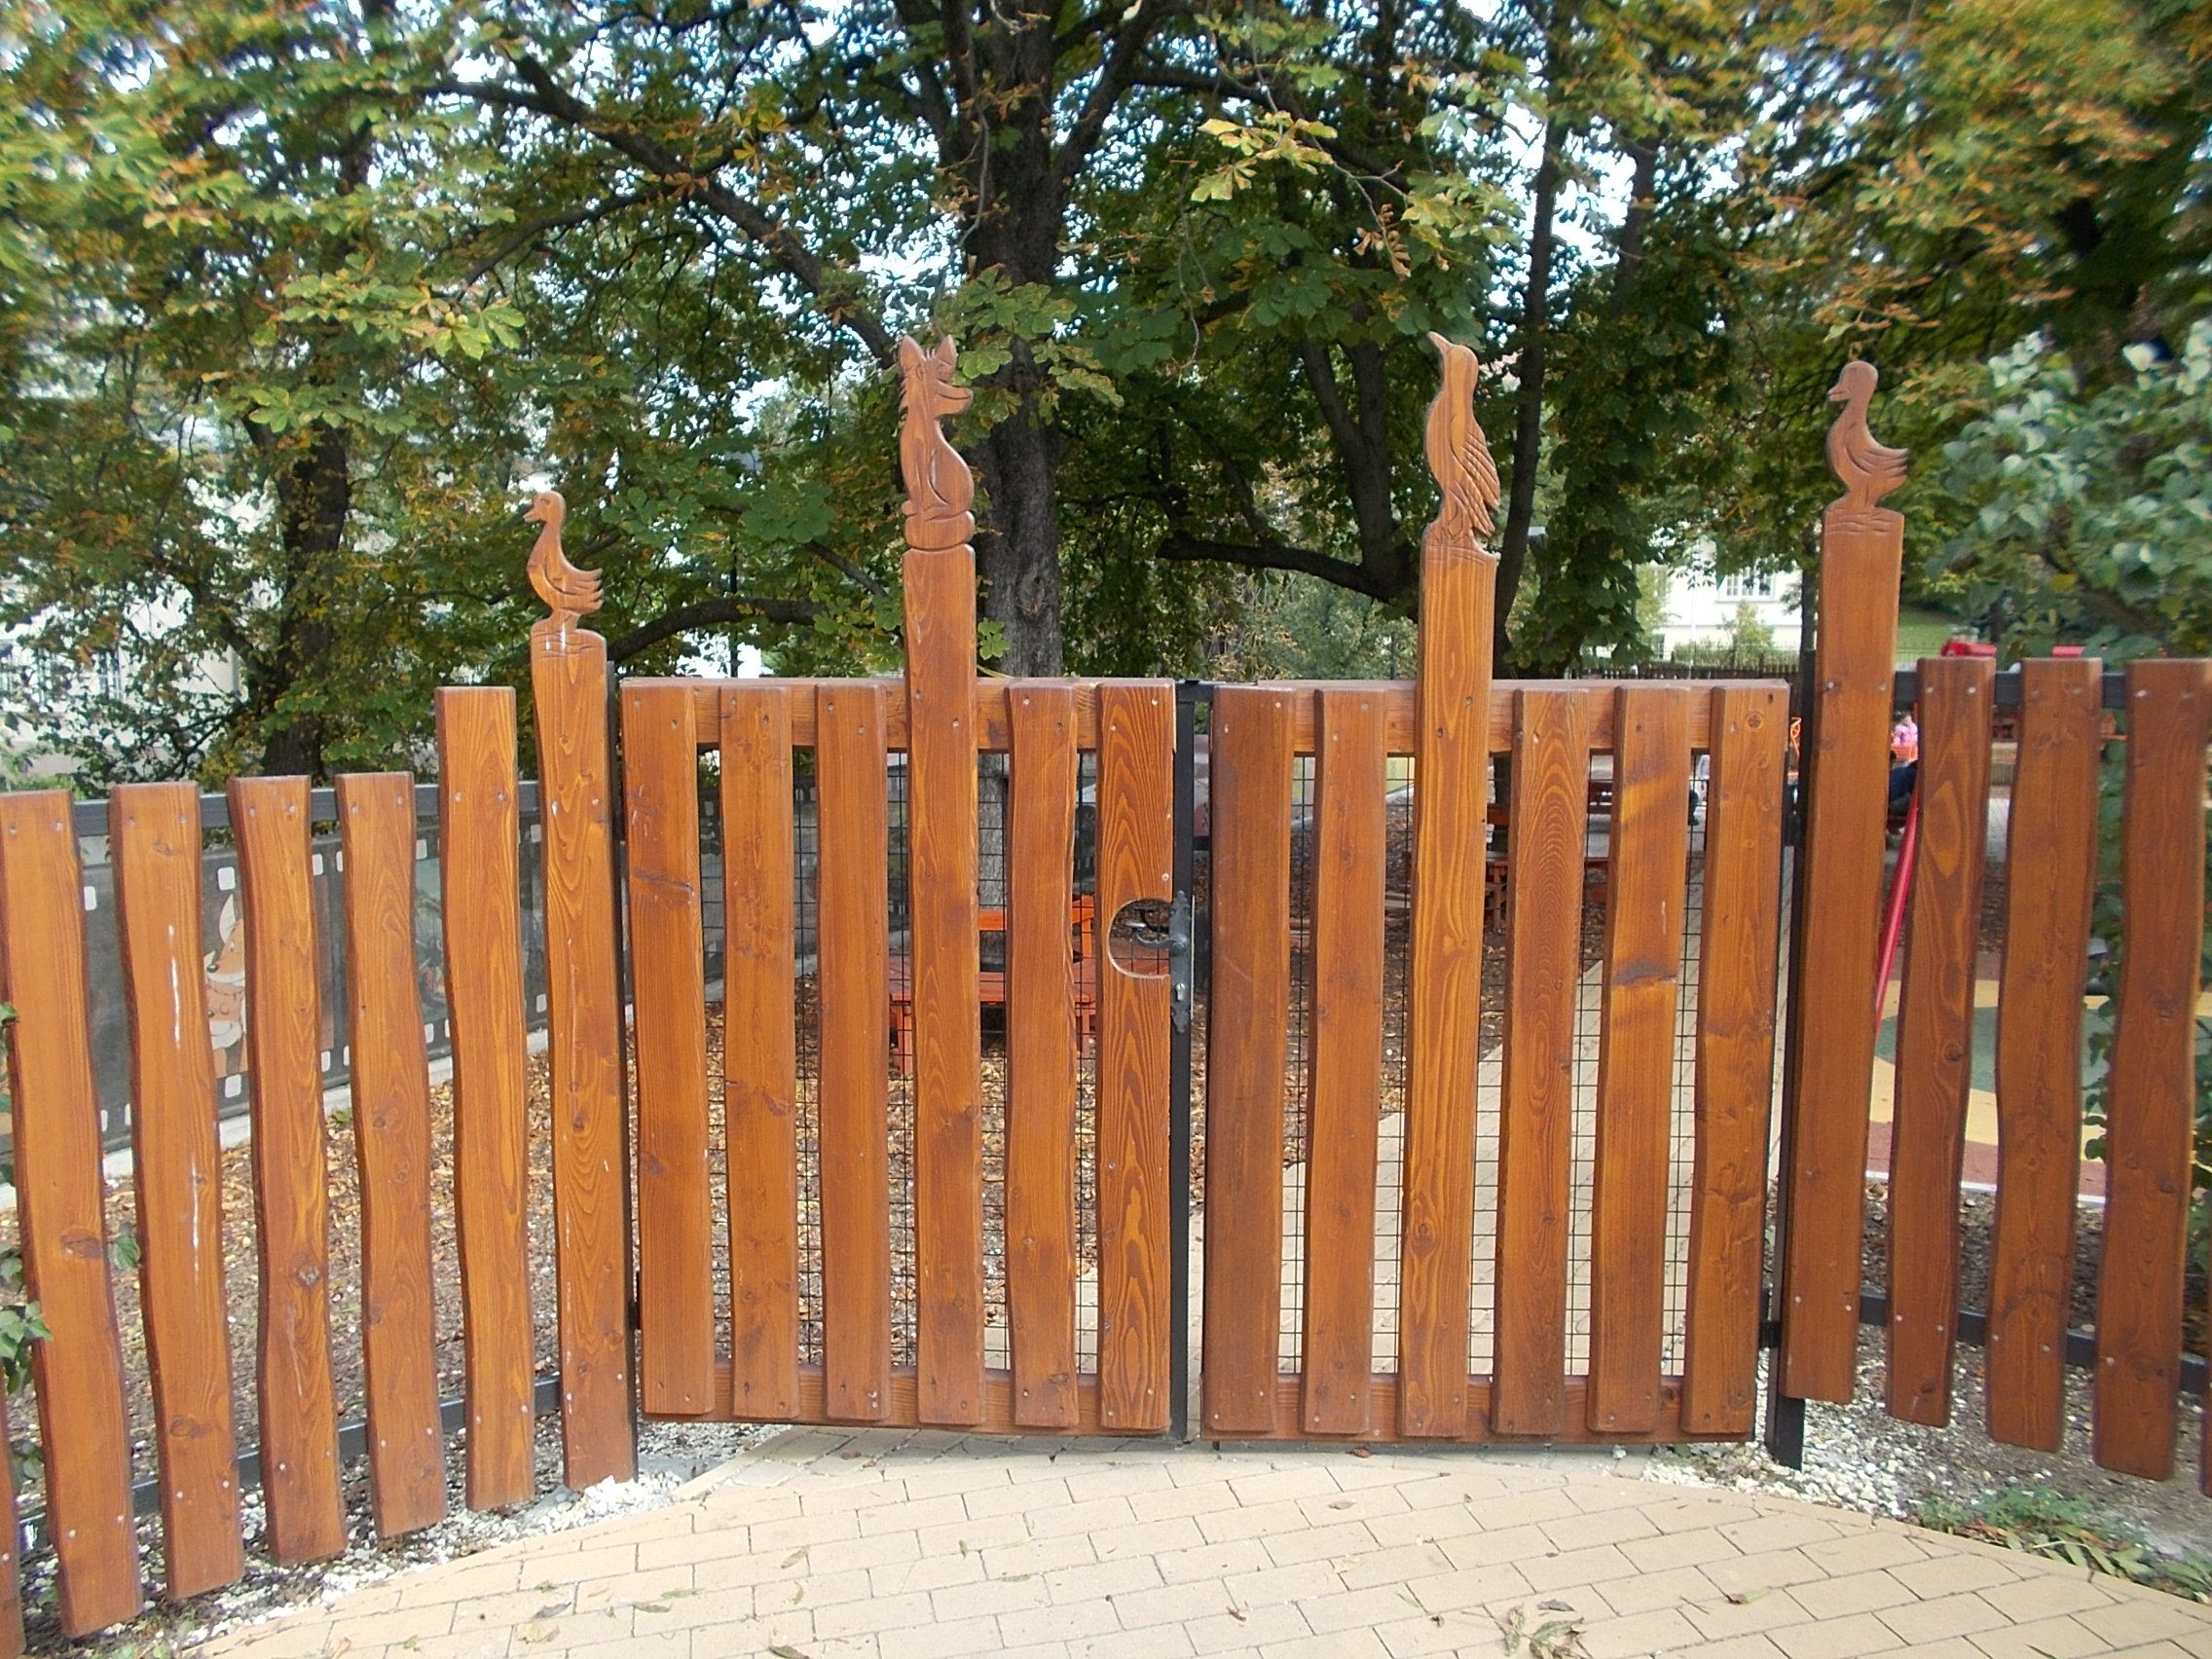 File:Vuk playground, wooden gate withanimal sculptures, 2016 Gellerthegy.jpg